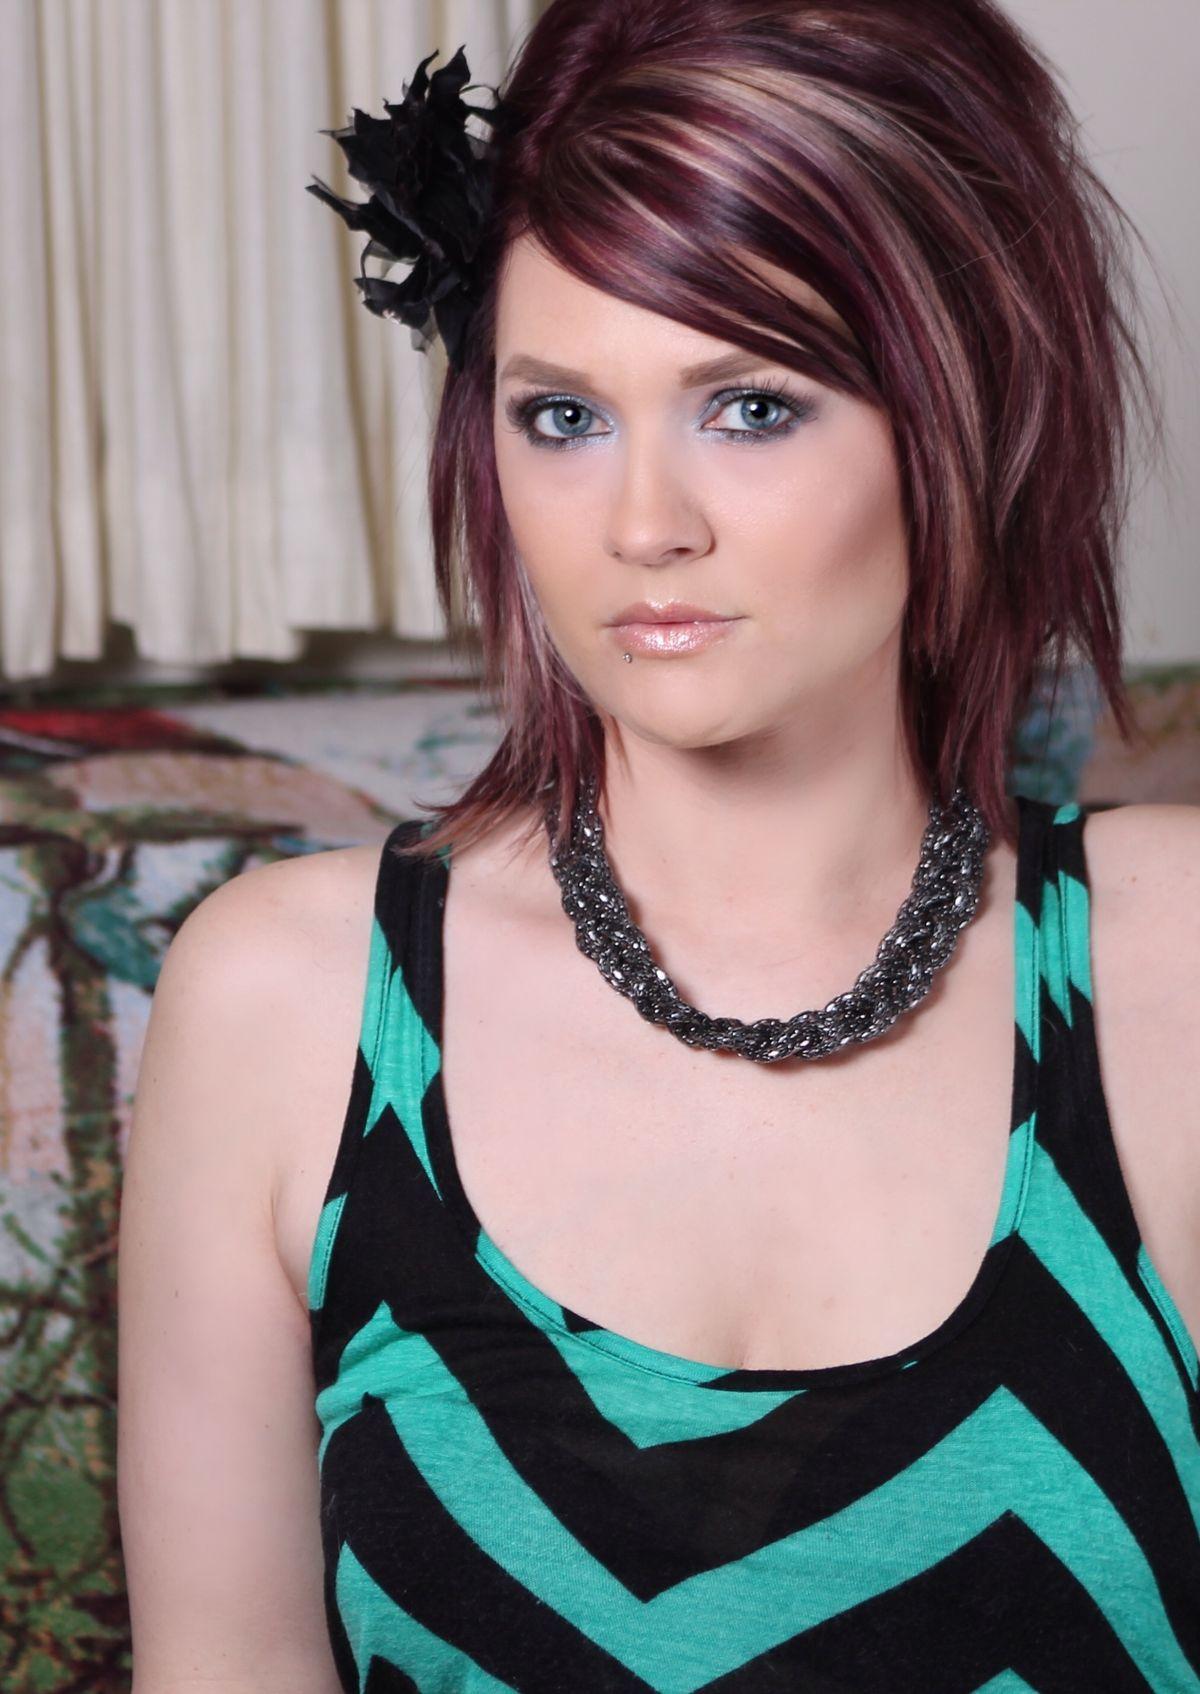 Pin By Margie Olinger On Hair Pinterest Hair Coloring Hair